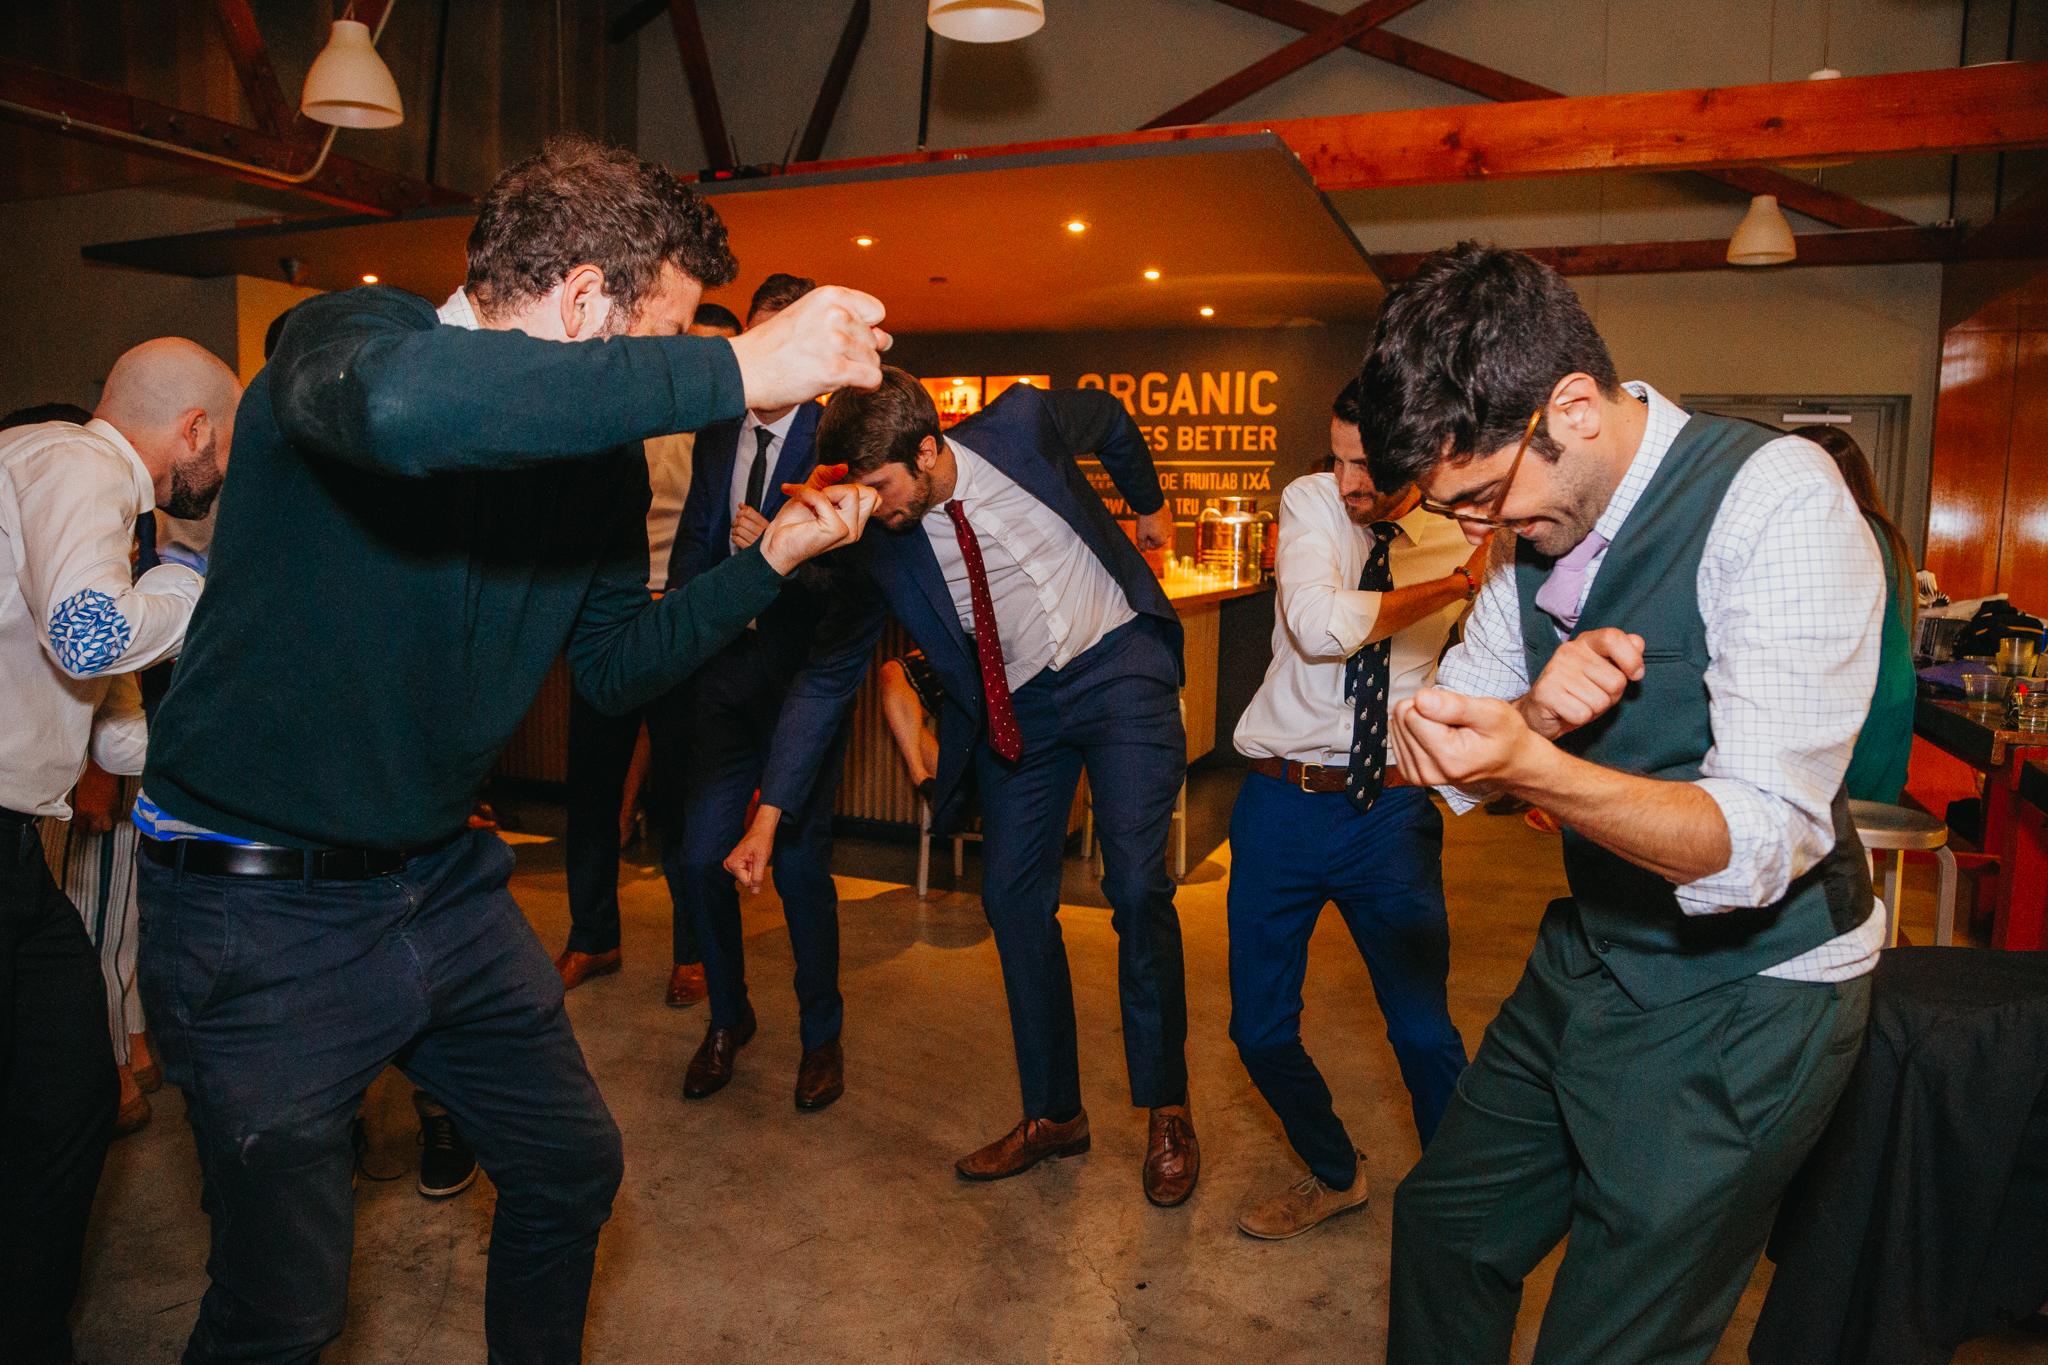 wedding-reception-dance-party-playlist-rebeccaylasotras